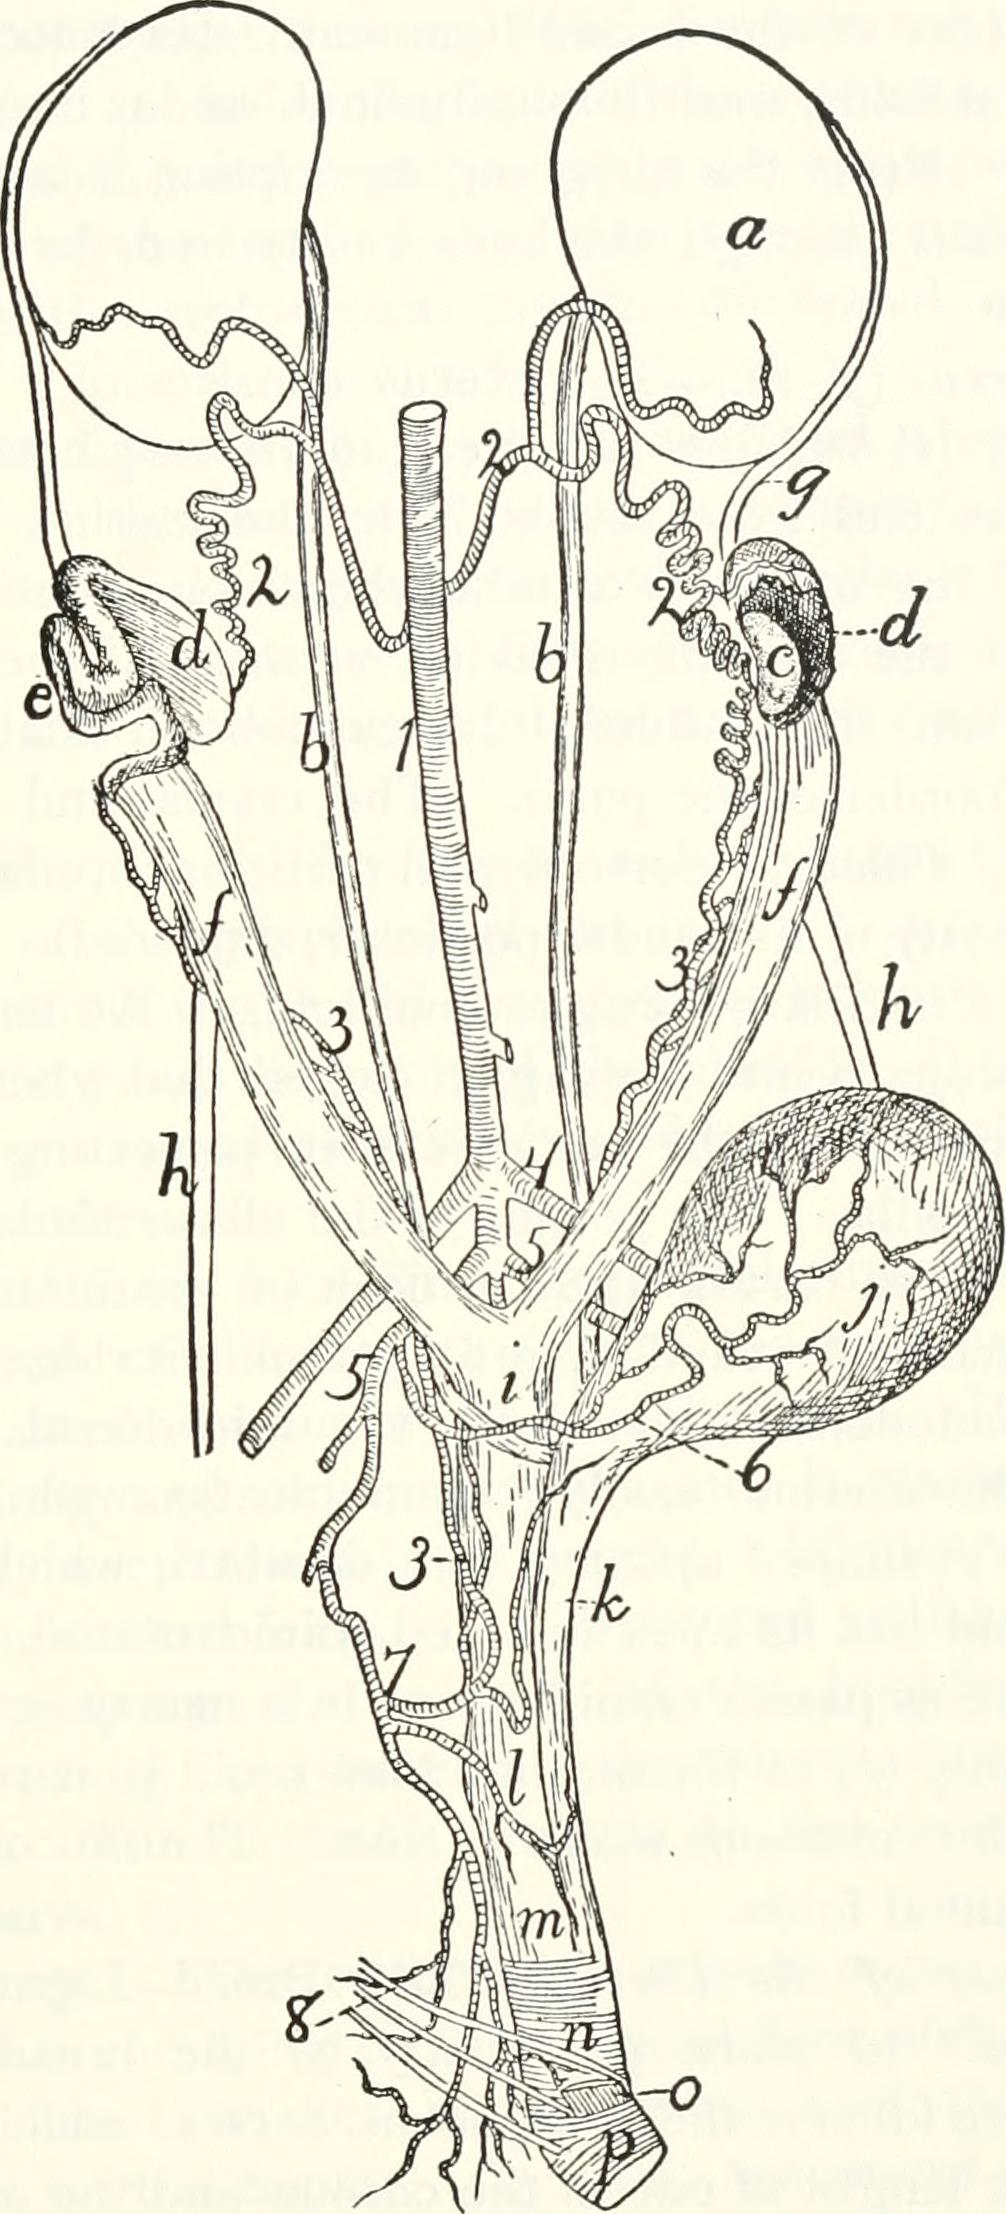 File:Anatomy of the cat (1991) (17571535364).jpg - Wikimedia Commons